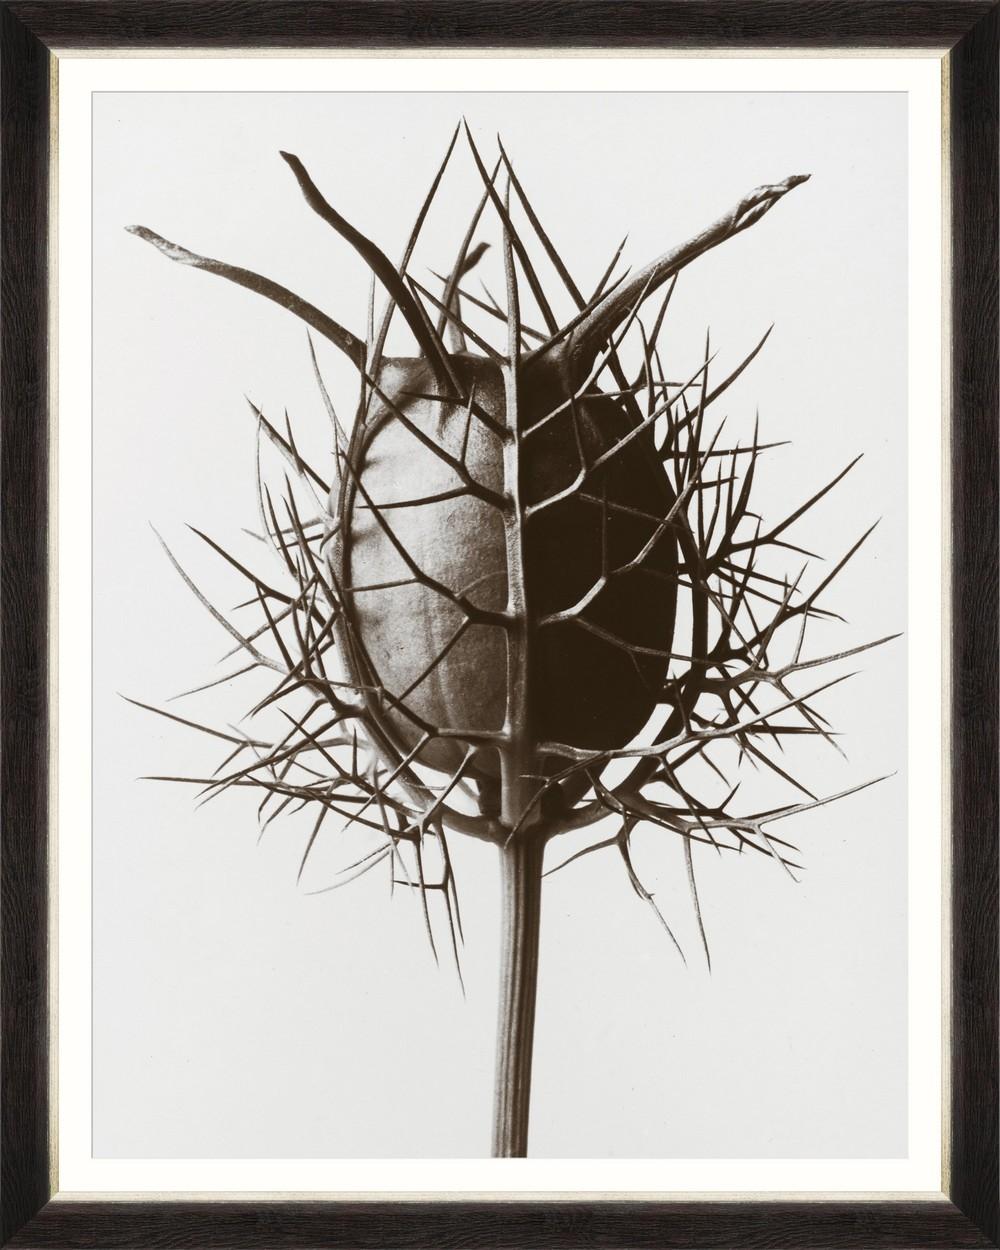 Tablou Framed Art Nigella Damascena By Blossfeldt somproduct.ro